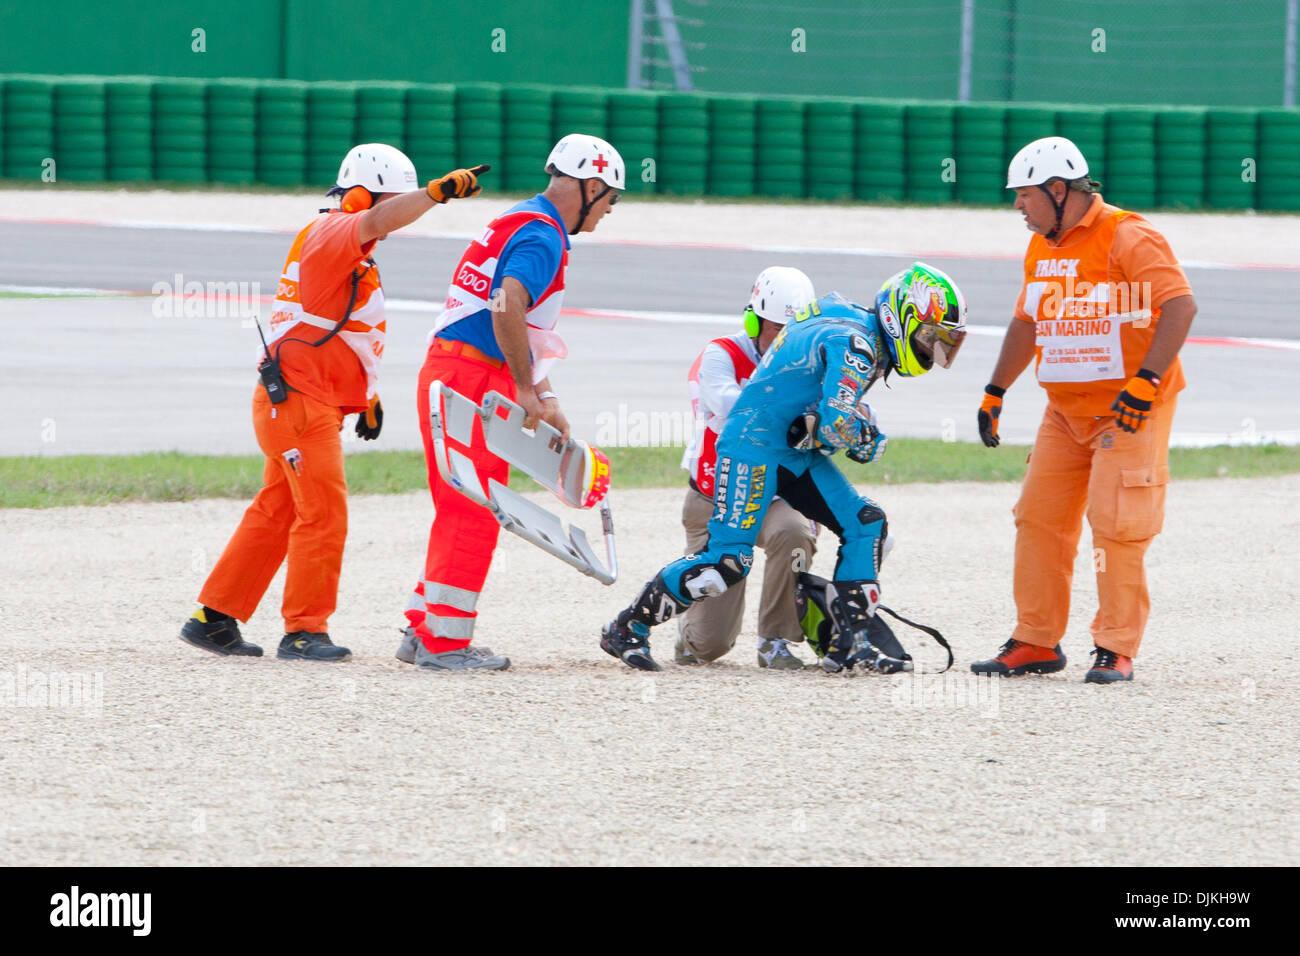 Sep. 07, 2010 - Misano Adriatico, Italy - Rizla Suzuki  rider Loris Capirossi (ITA #65) after a crash during the San Marino GP in Misano Adriatico, Italy. (Credit Image: © Andrea Ranalli/Southcreek Global/ZUMApress.com) - Stock Image